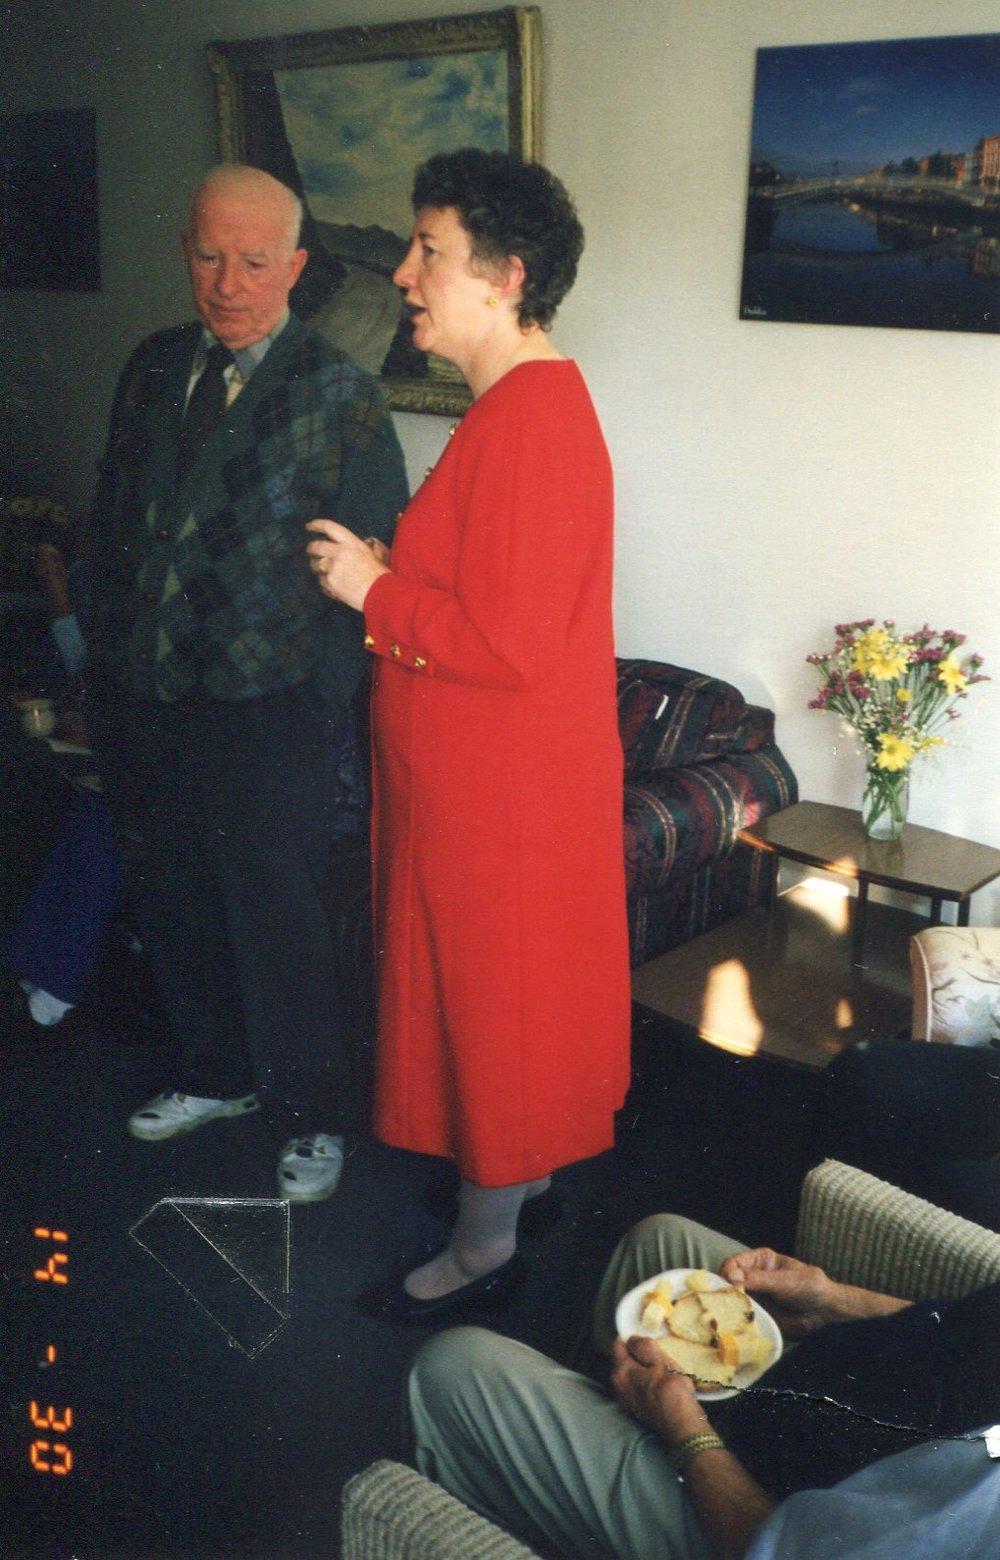 Dr. Jacinta O'Halloran & Jim McCaffrey